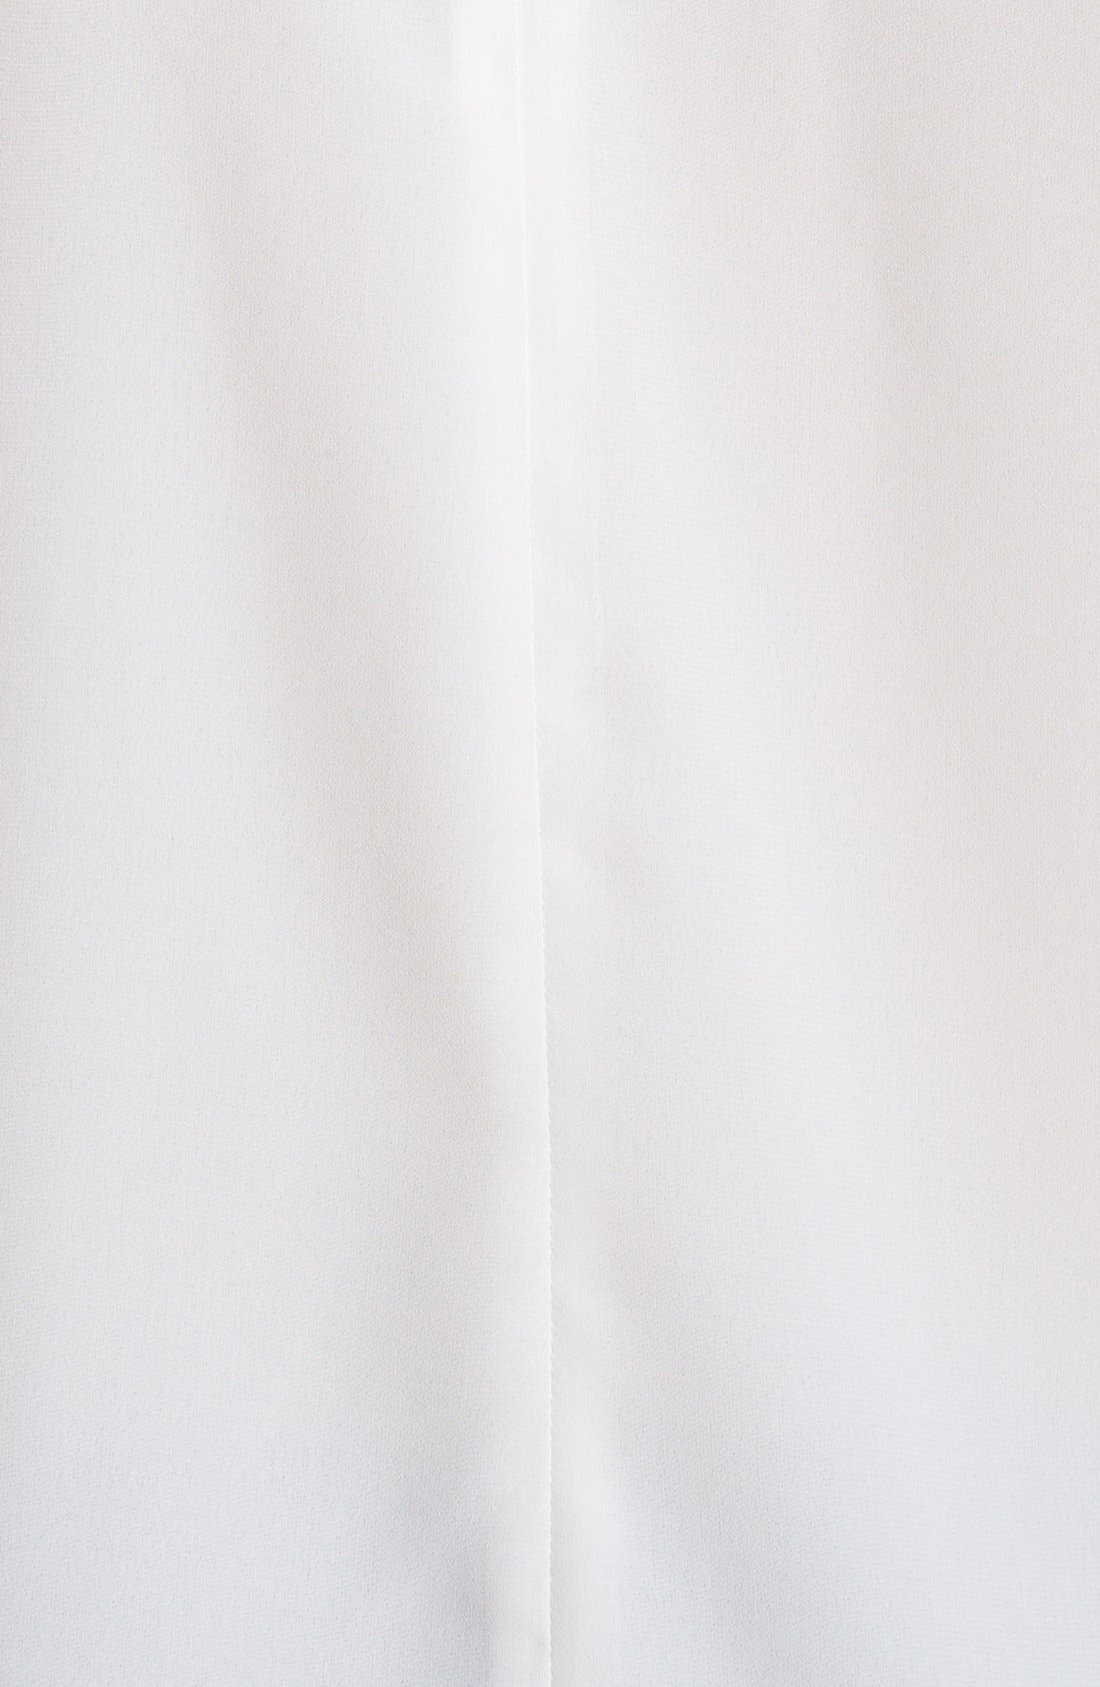 Alternate Image 3  - Robbi & Nikki Studded Neck Top